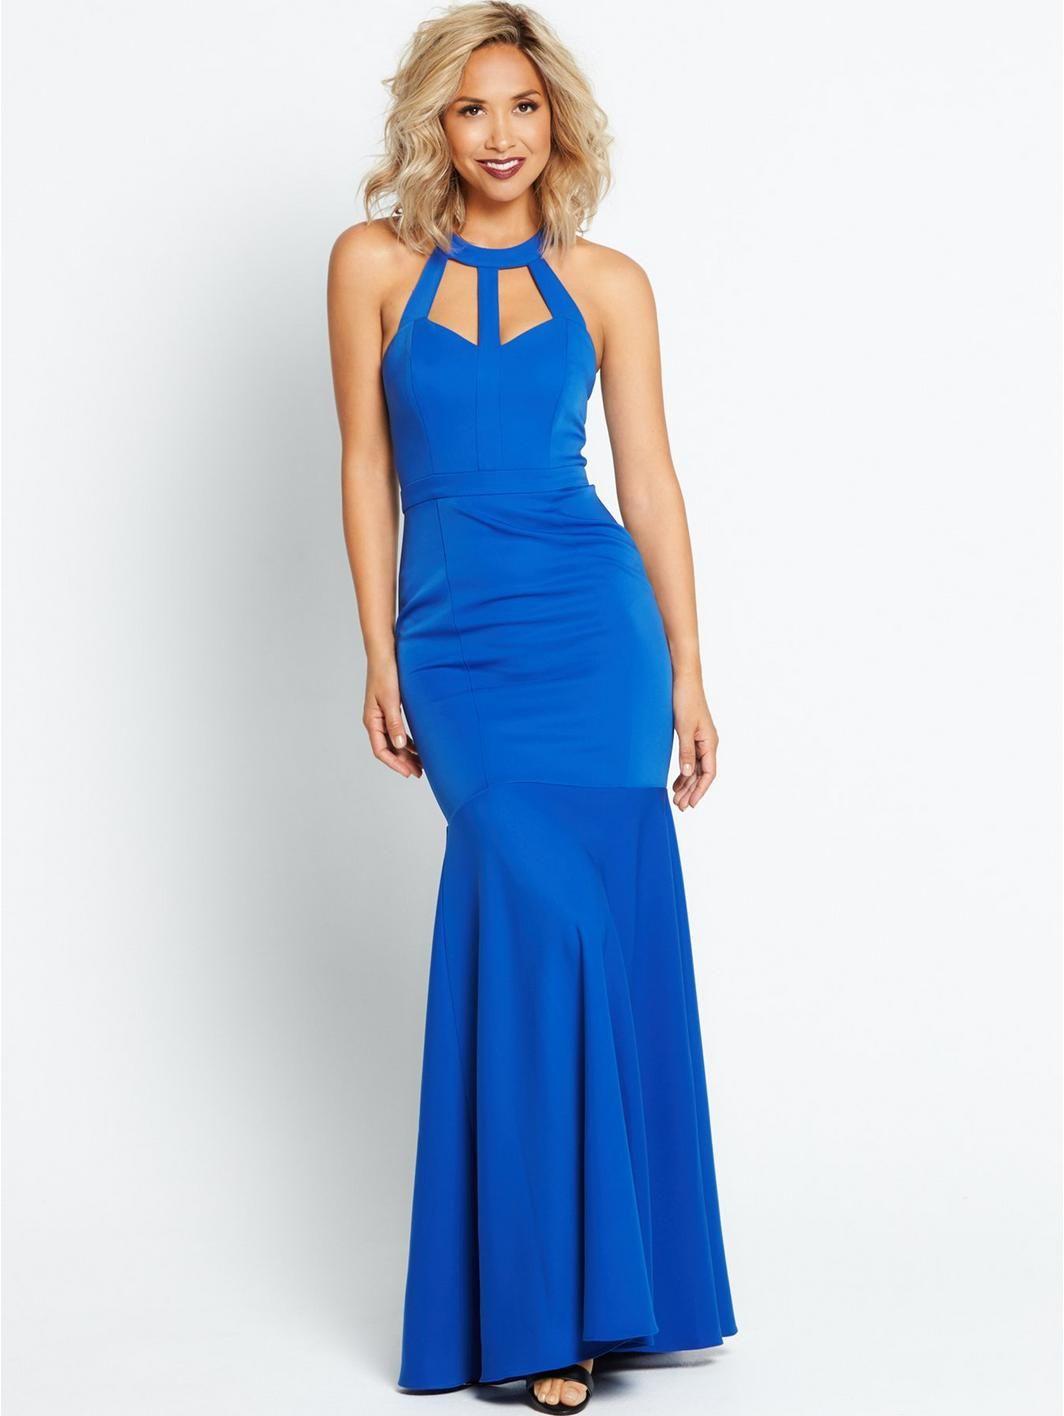 Very.uk Evening Dresses